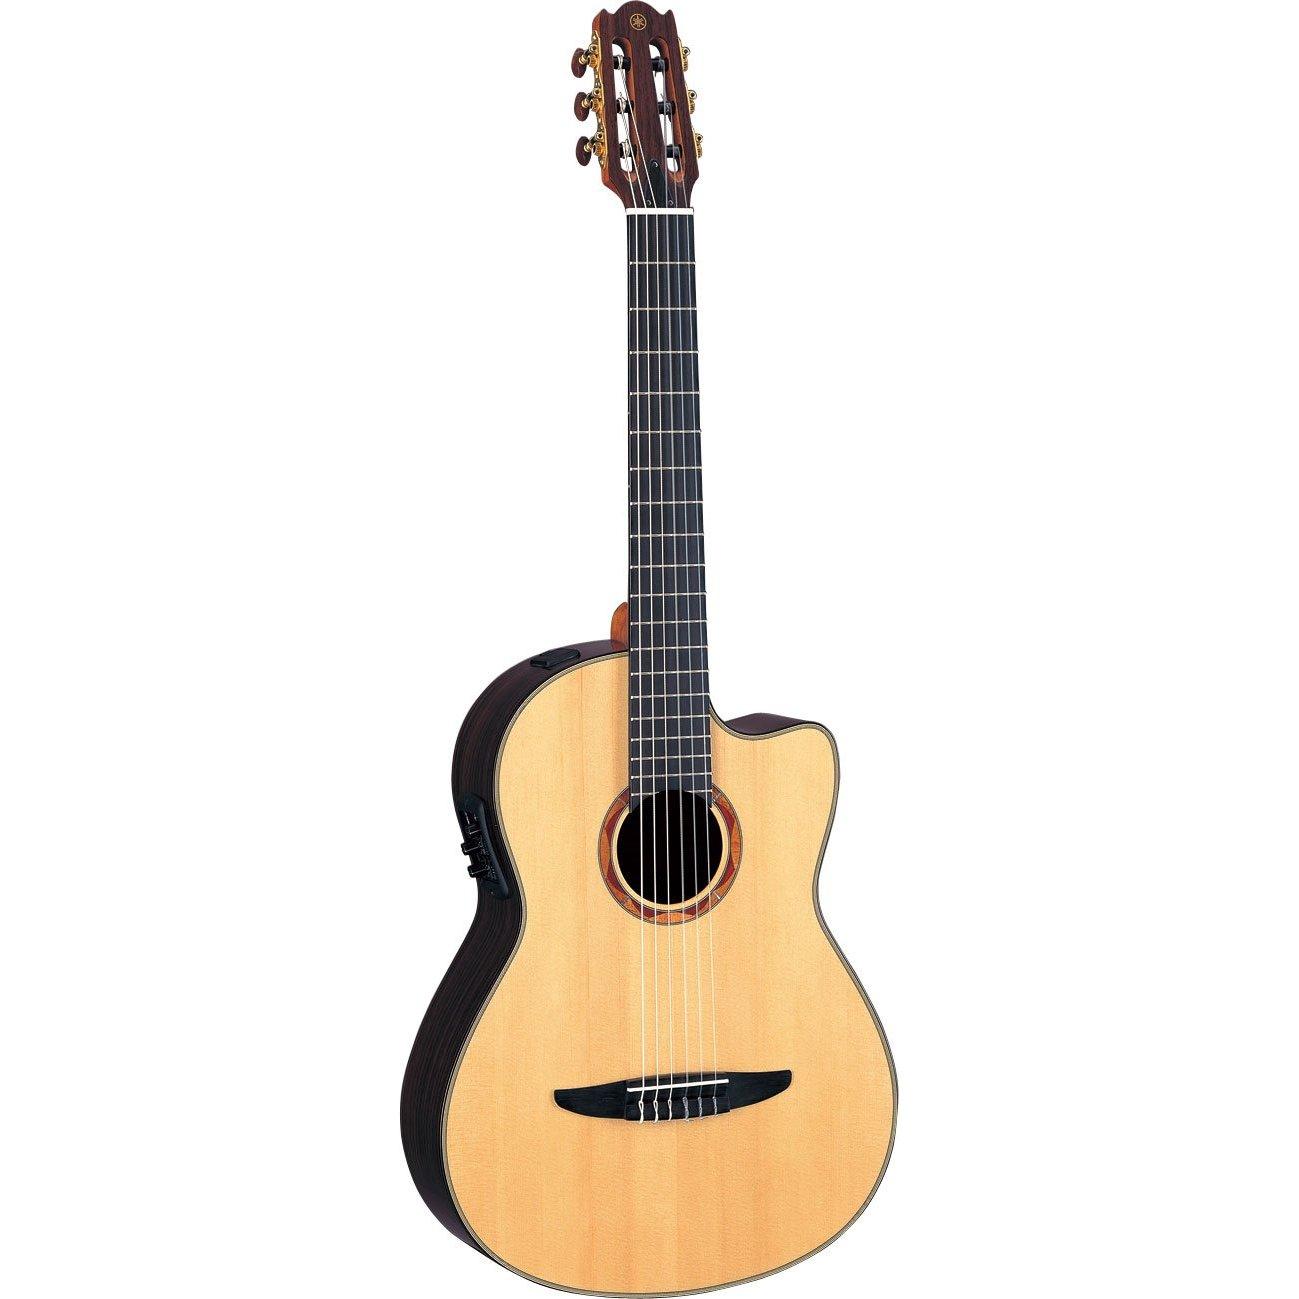 Yamaha Classical Guitar With Pickup